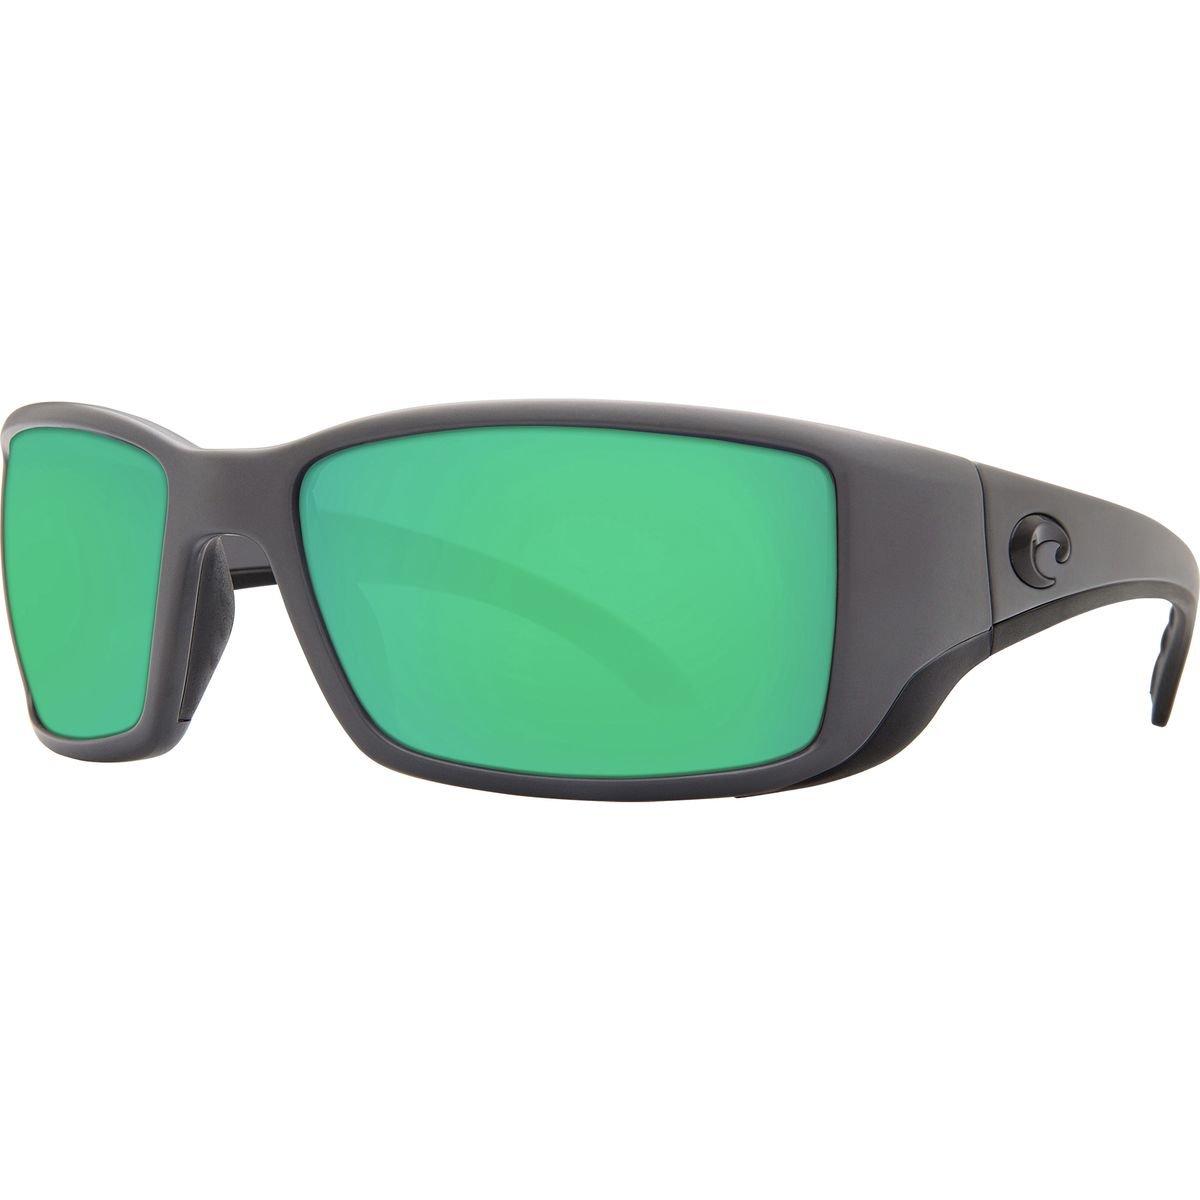 Direct BL98OGMGLP Costa Del Mar Blackfin Sunglasses Matte Gray//Green Mirror 580Glass Pro-Motion Distributing